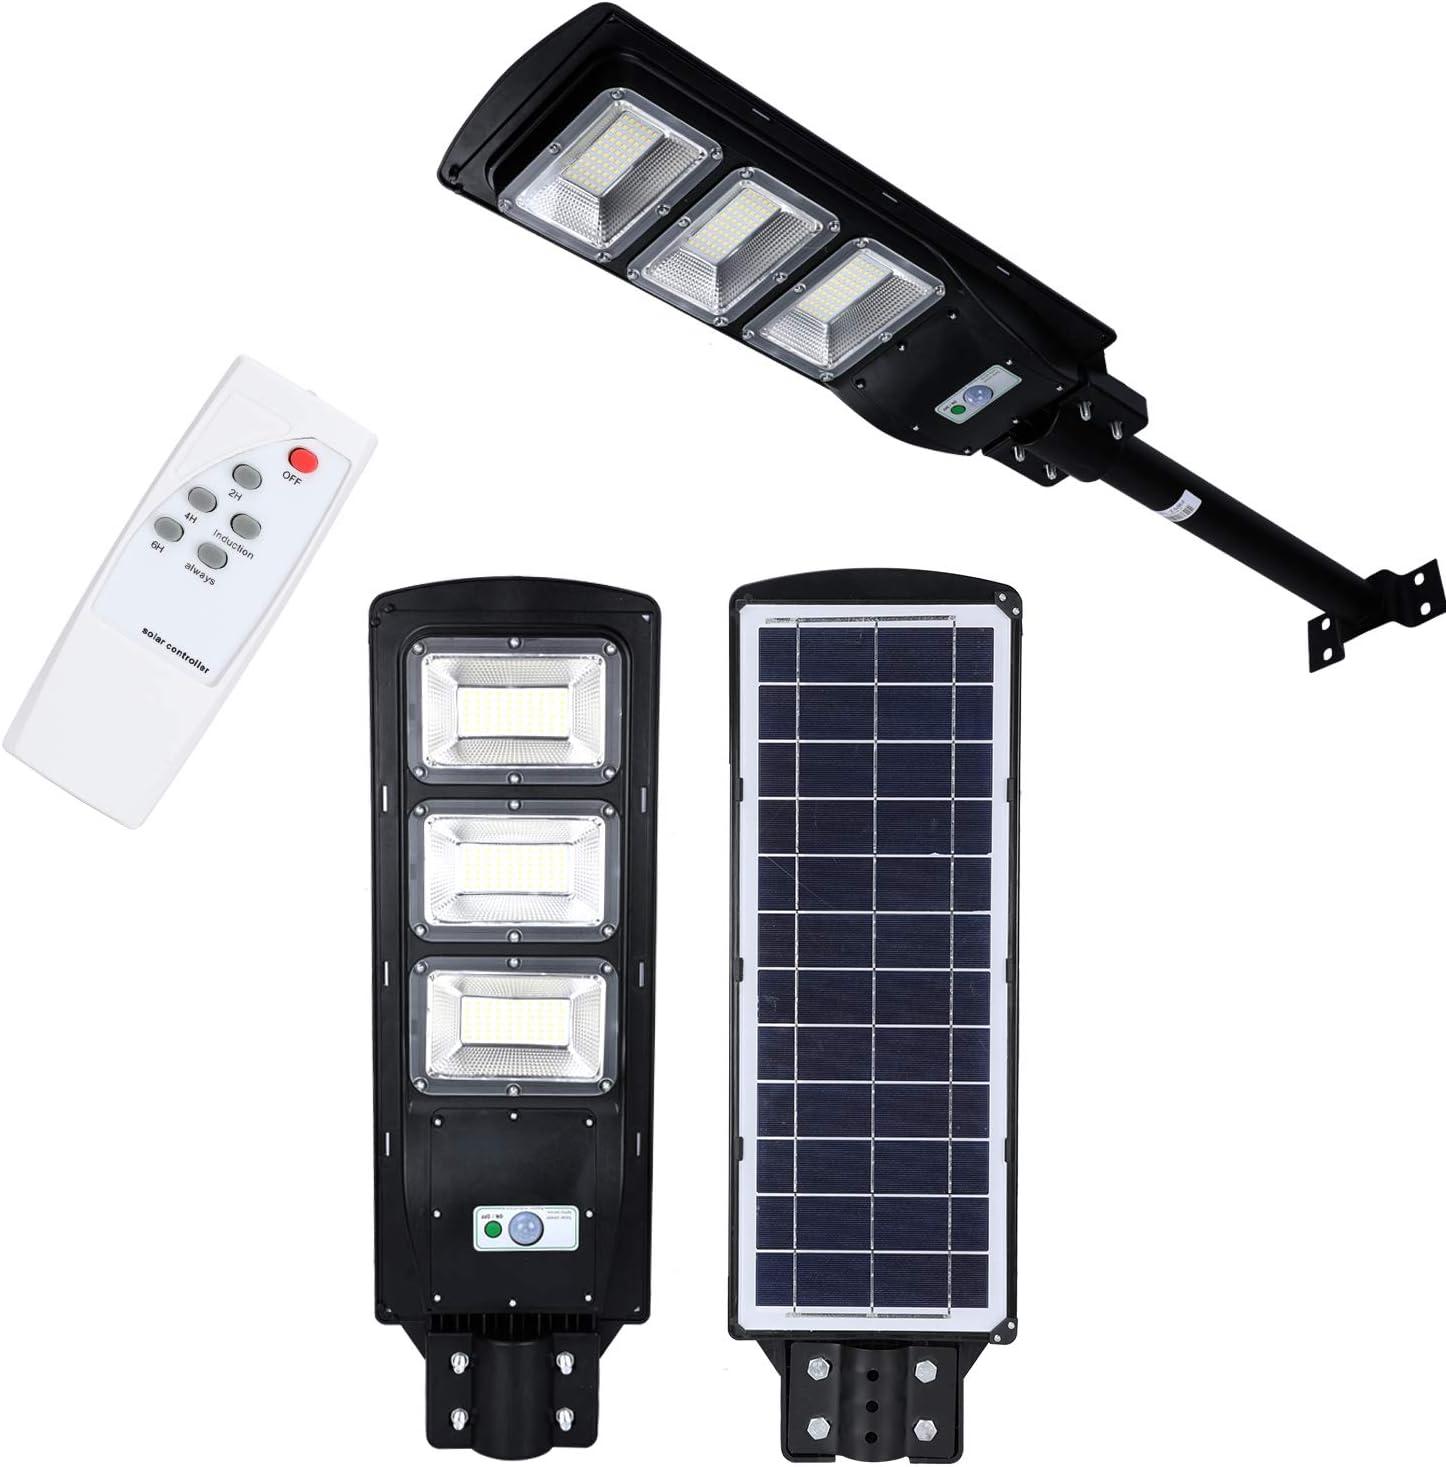 TRUSBER Street Light Solar Powered 90W 180pc LED Beads Auto Radar Sensor Wall Lamp Lumens 6000K Waterproof Remote Control Lighting for Yard,Garden,Villa,Easy Installment Outdoor Dusk to Dawn Lamp(90)